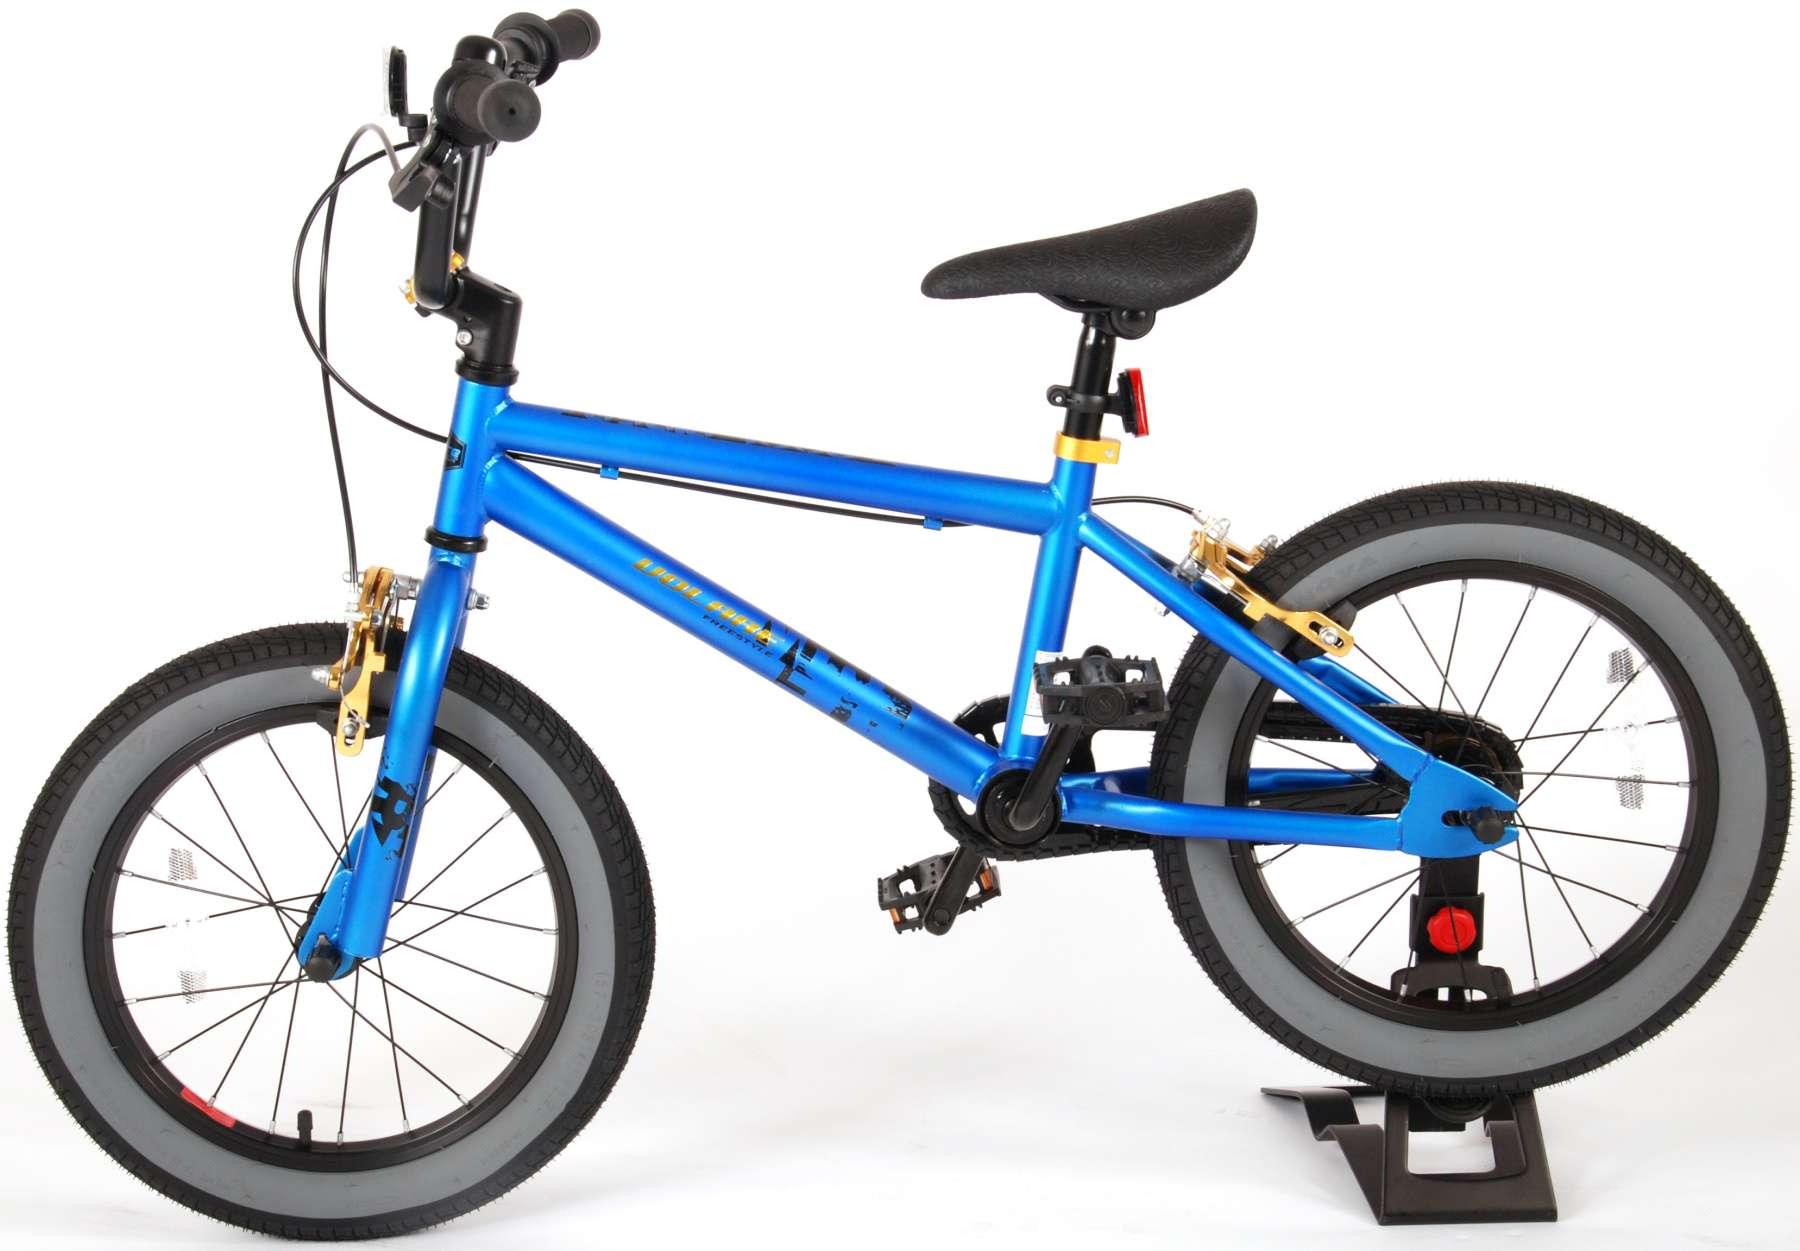 Cool Rider ohne Rücktrittbremse  Kinderfahrrad - 16 Zoll - Blau